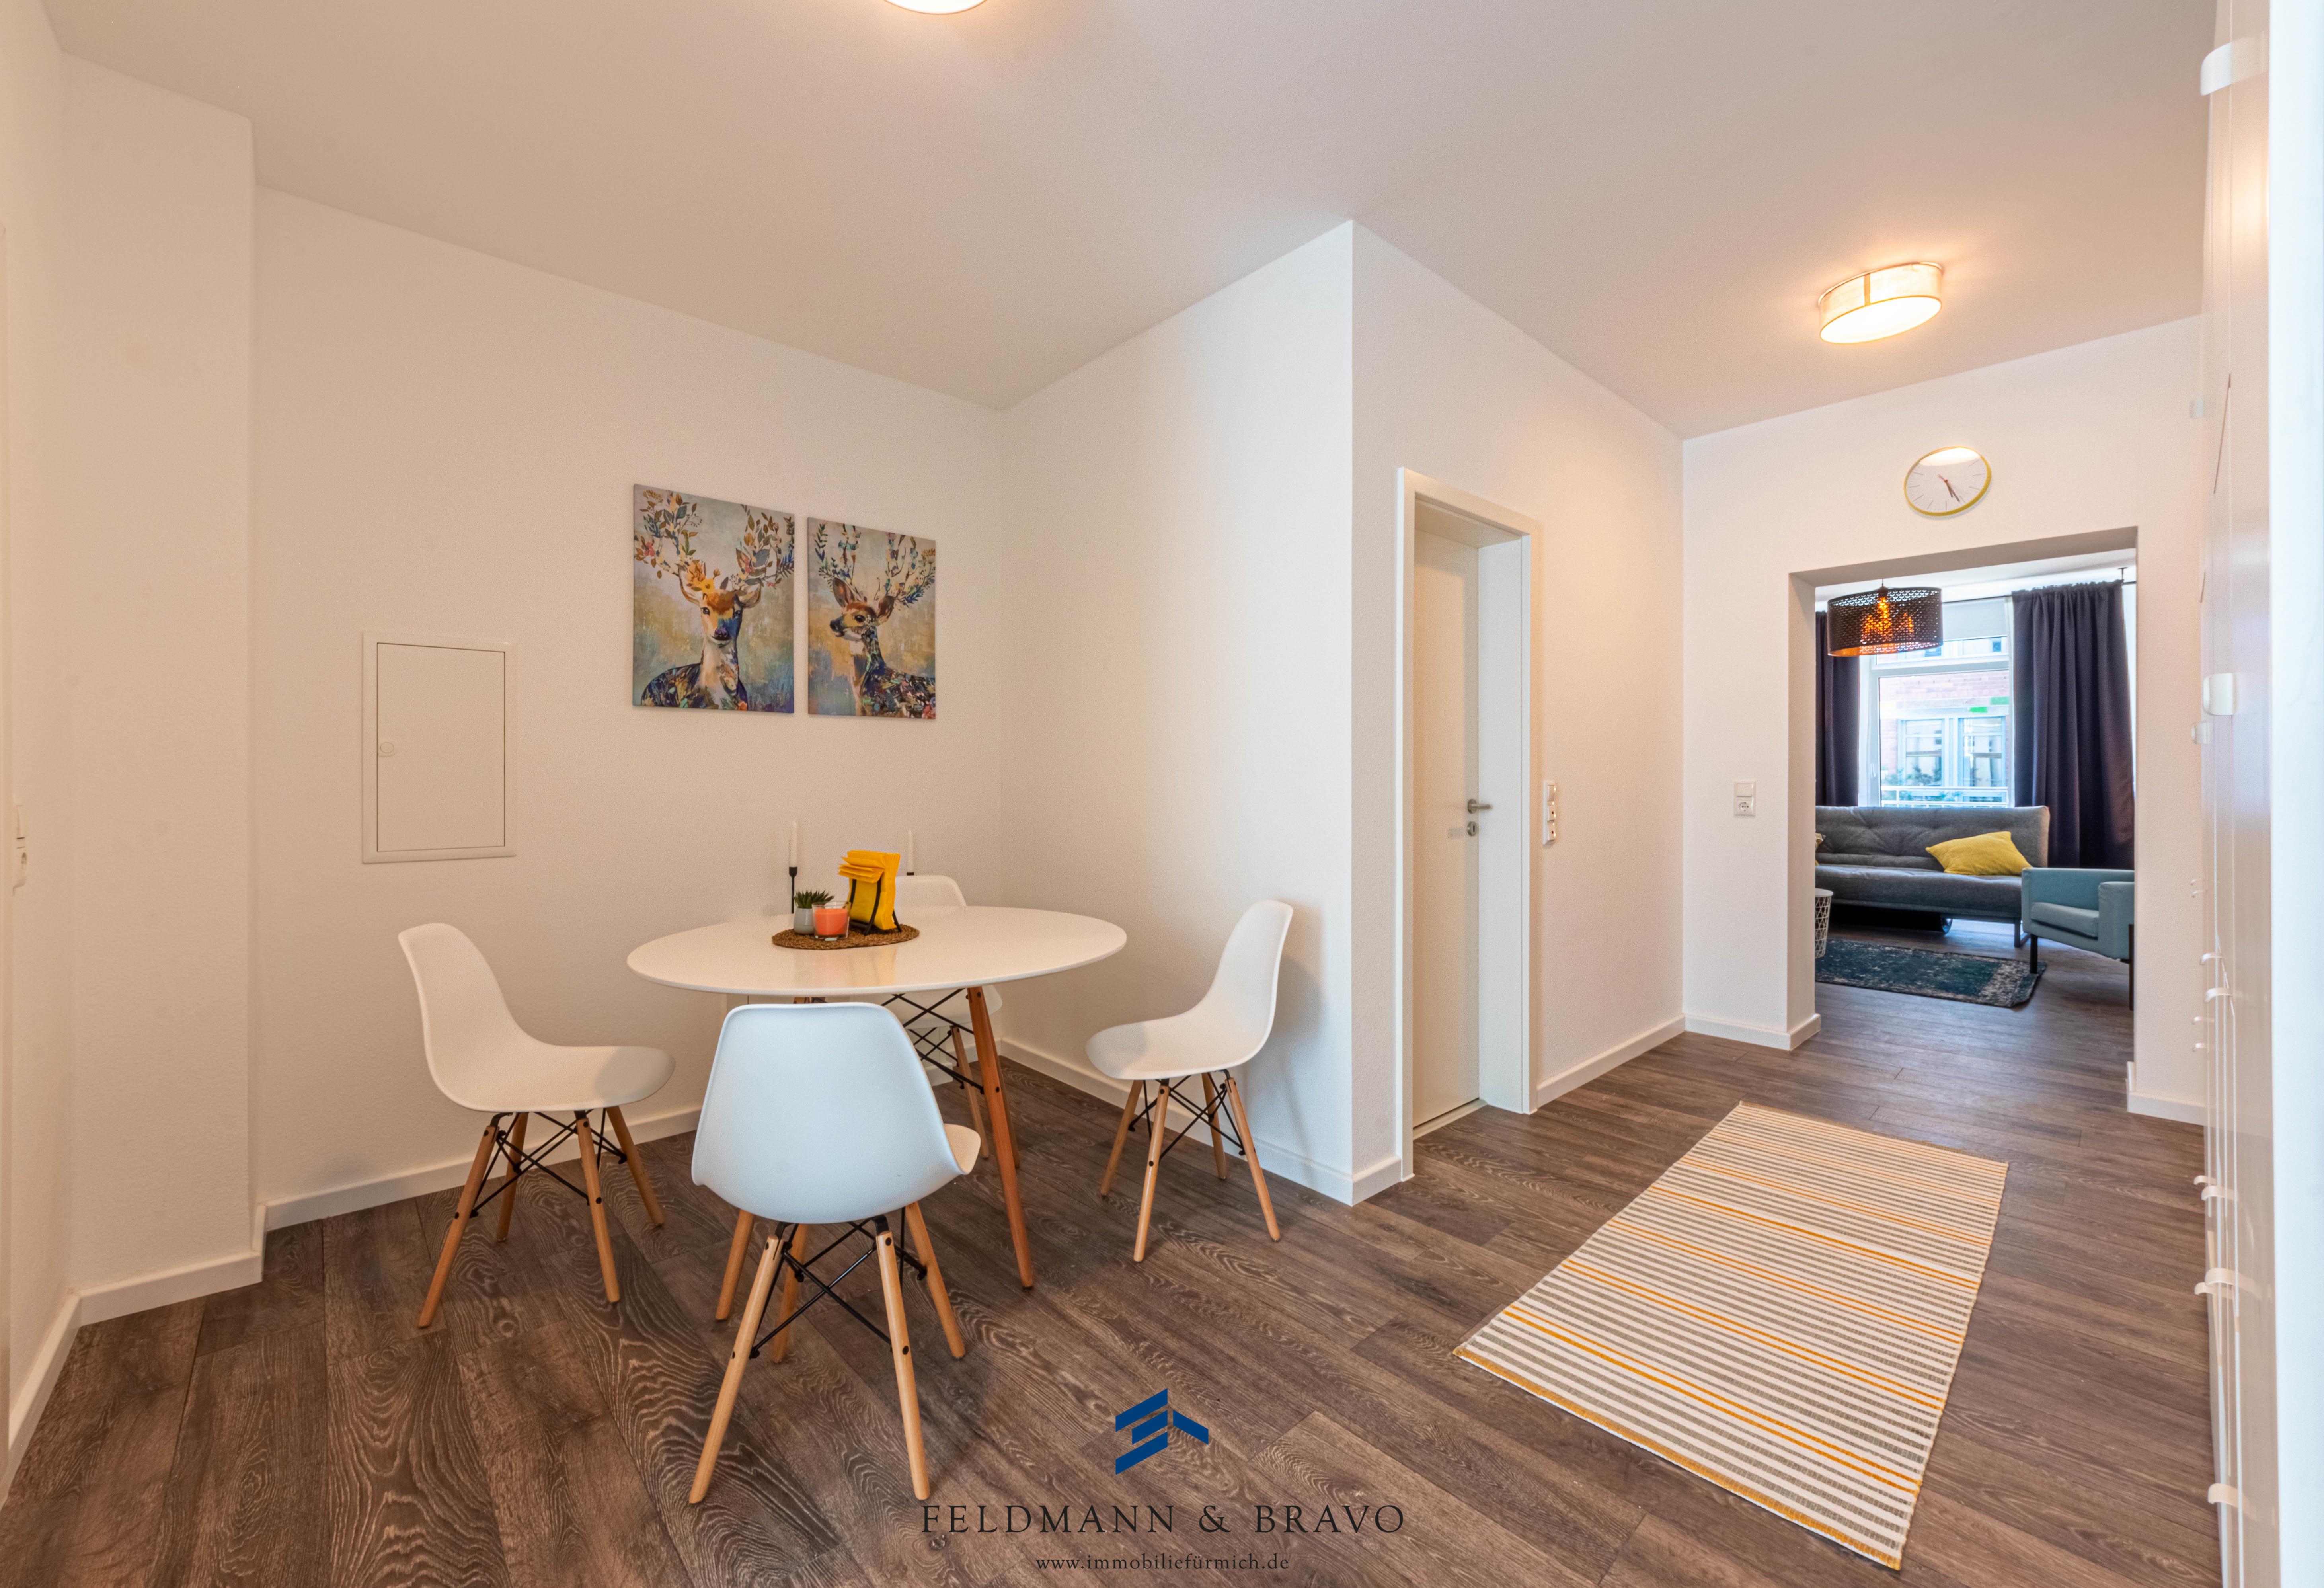 1 Bed Apartment At Hauptstraße 128 51373 Leverkusen